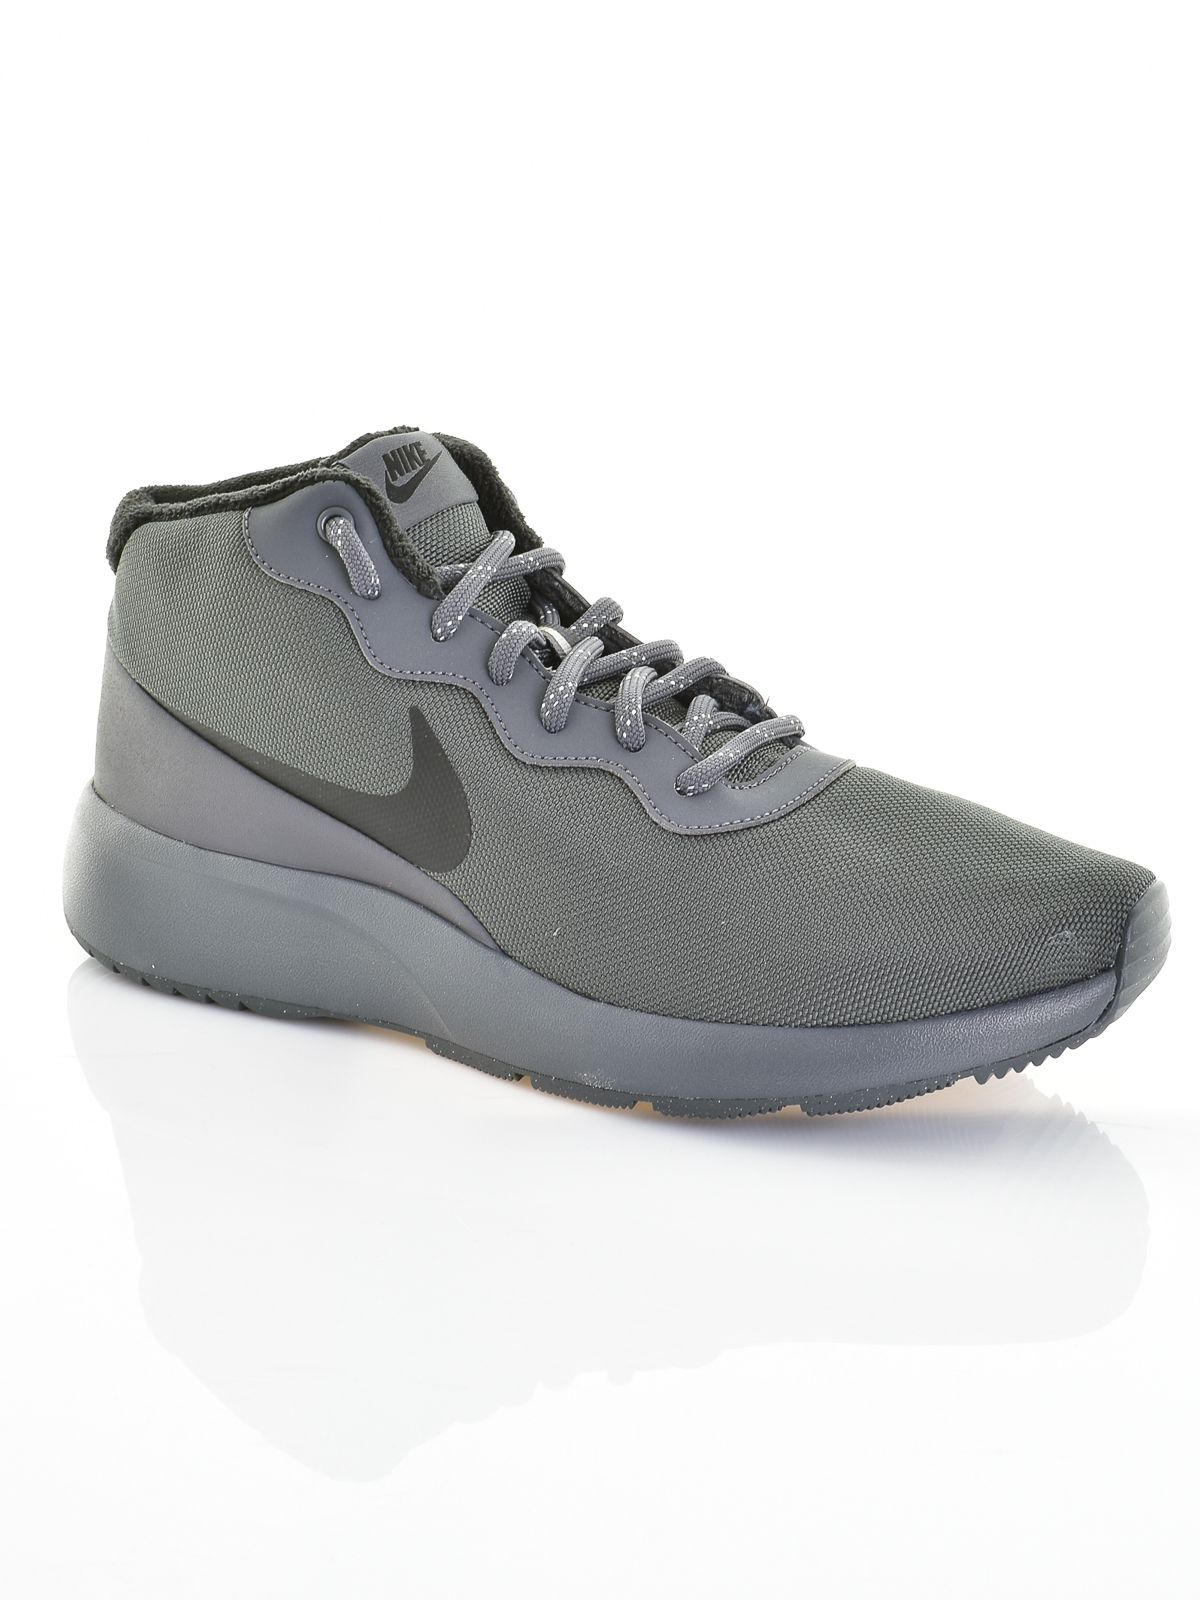 Akciós | Nike férfi cipő TANJUN CHUKKA | Markasbolt.hu